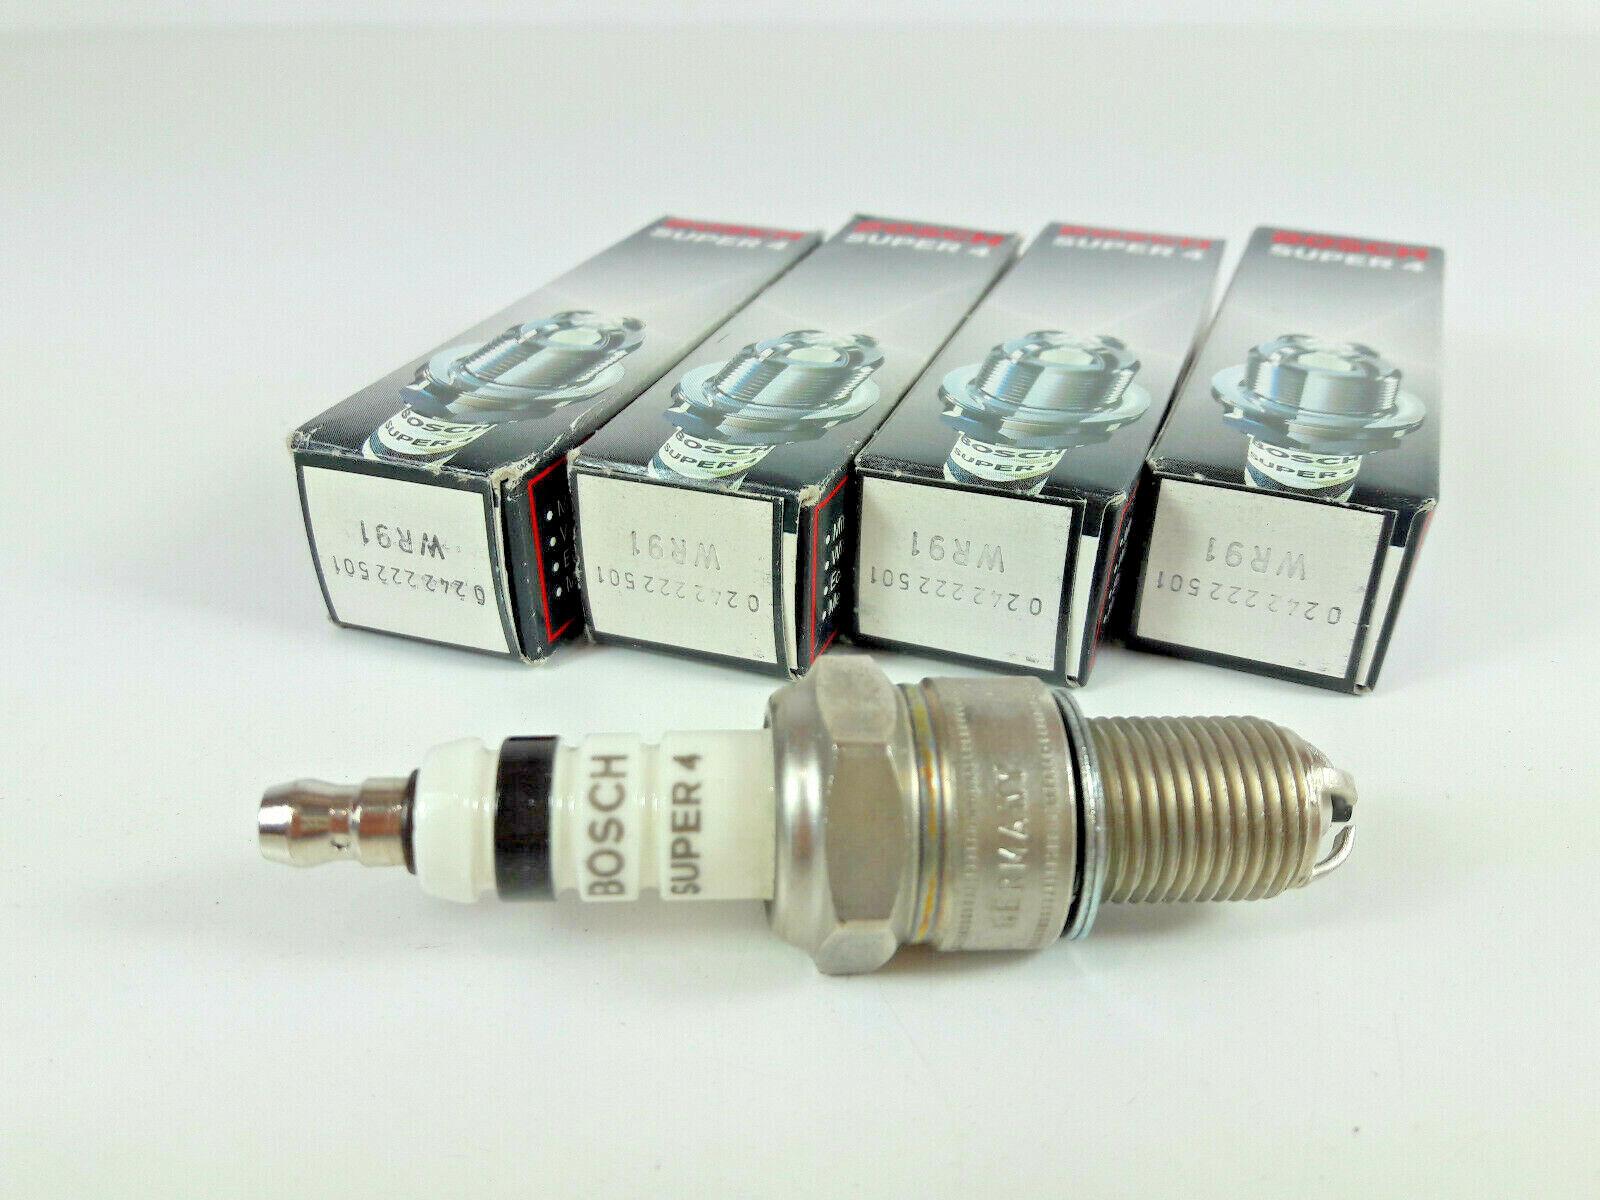 Bosch bujía m5a Spark Plug Bougie candela bujía tennpluggen